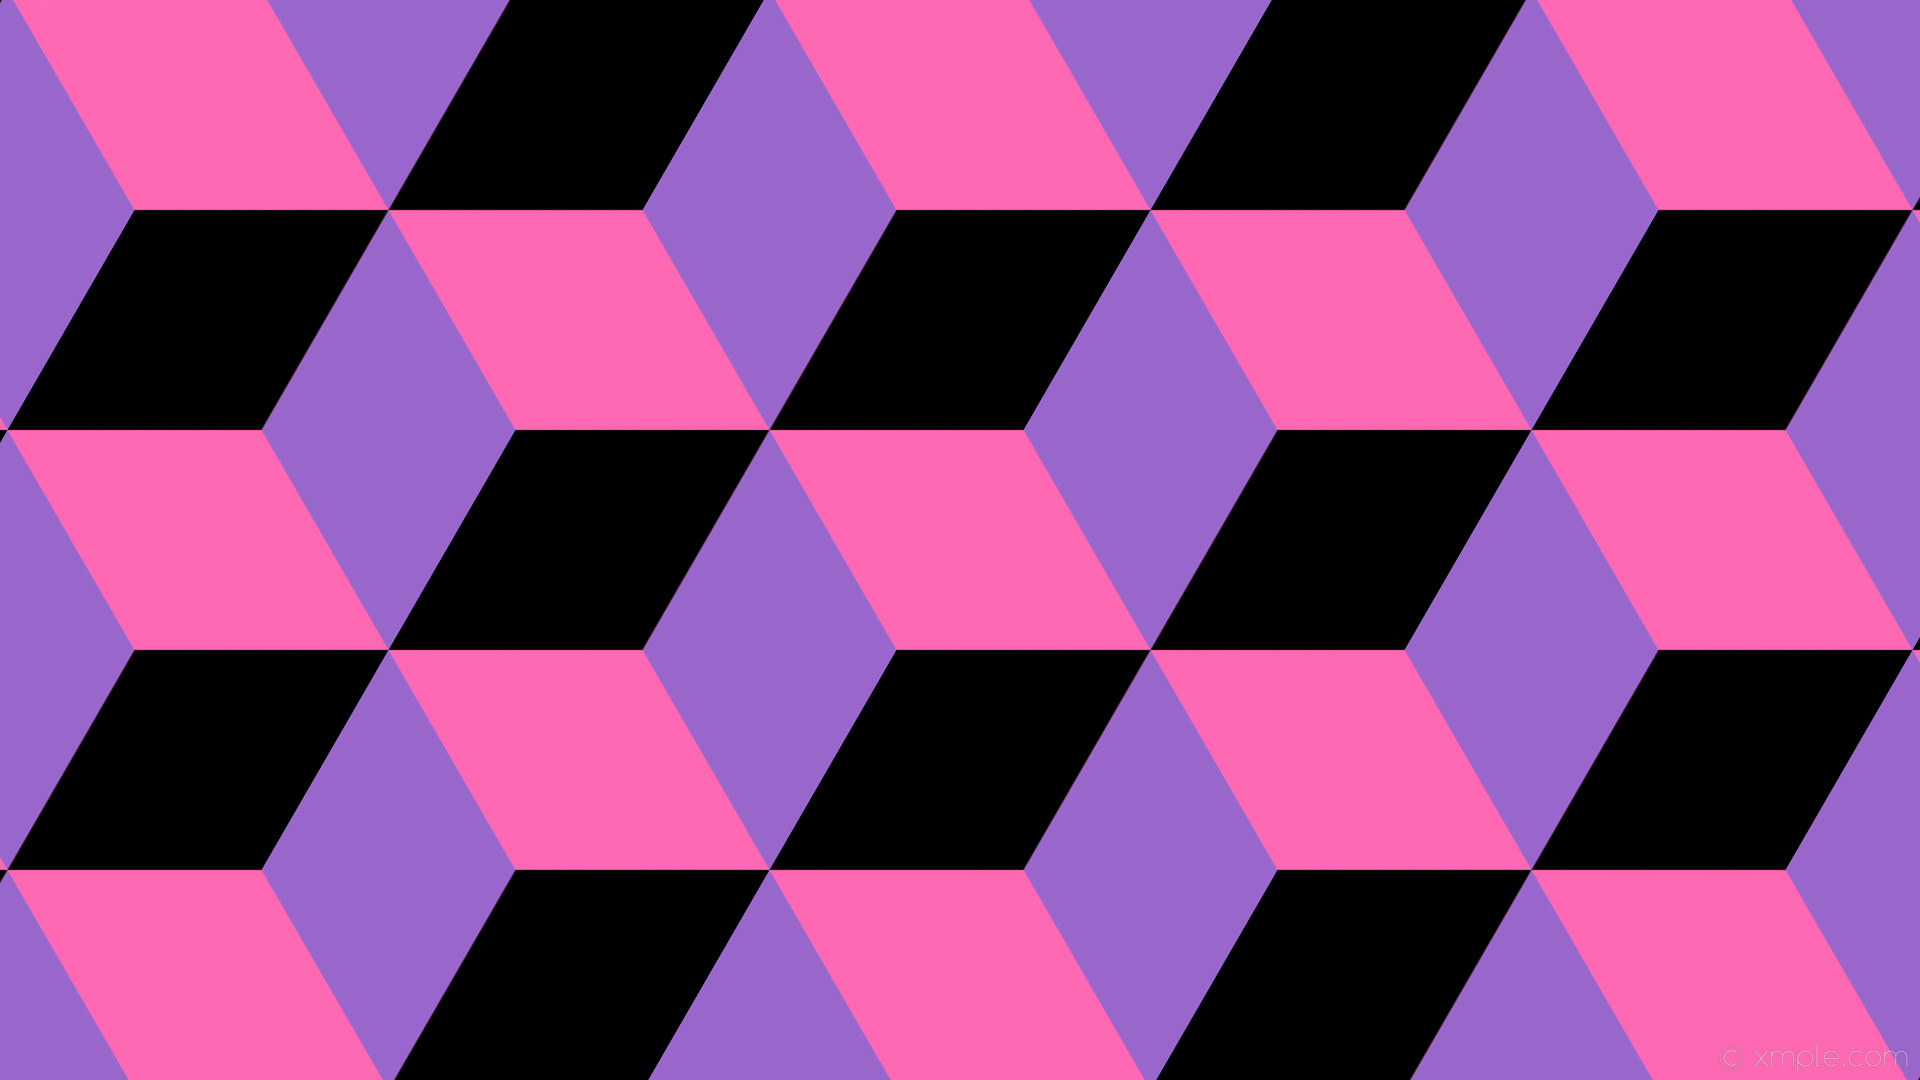 wallpaper 3d cubes purple black pink hot pink amethyst #ff69b4 #9966cc  #000000 150